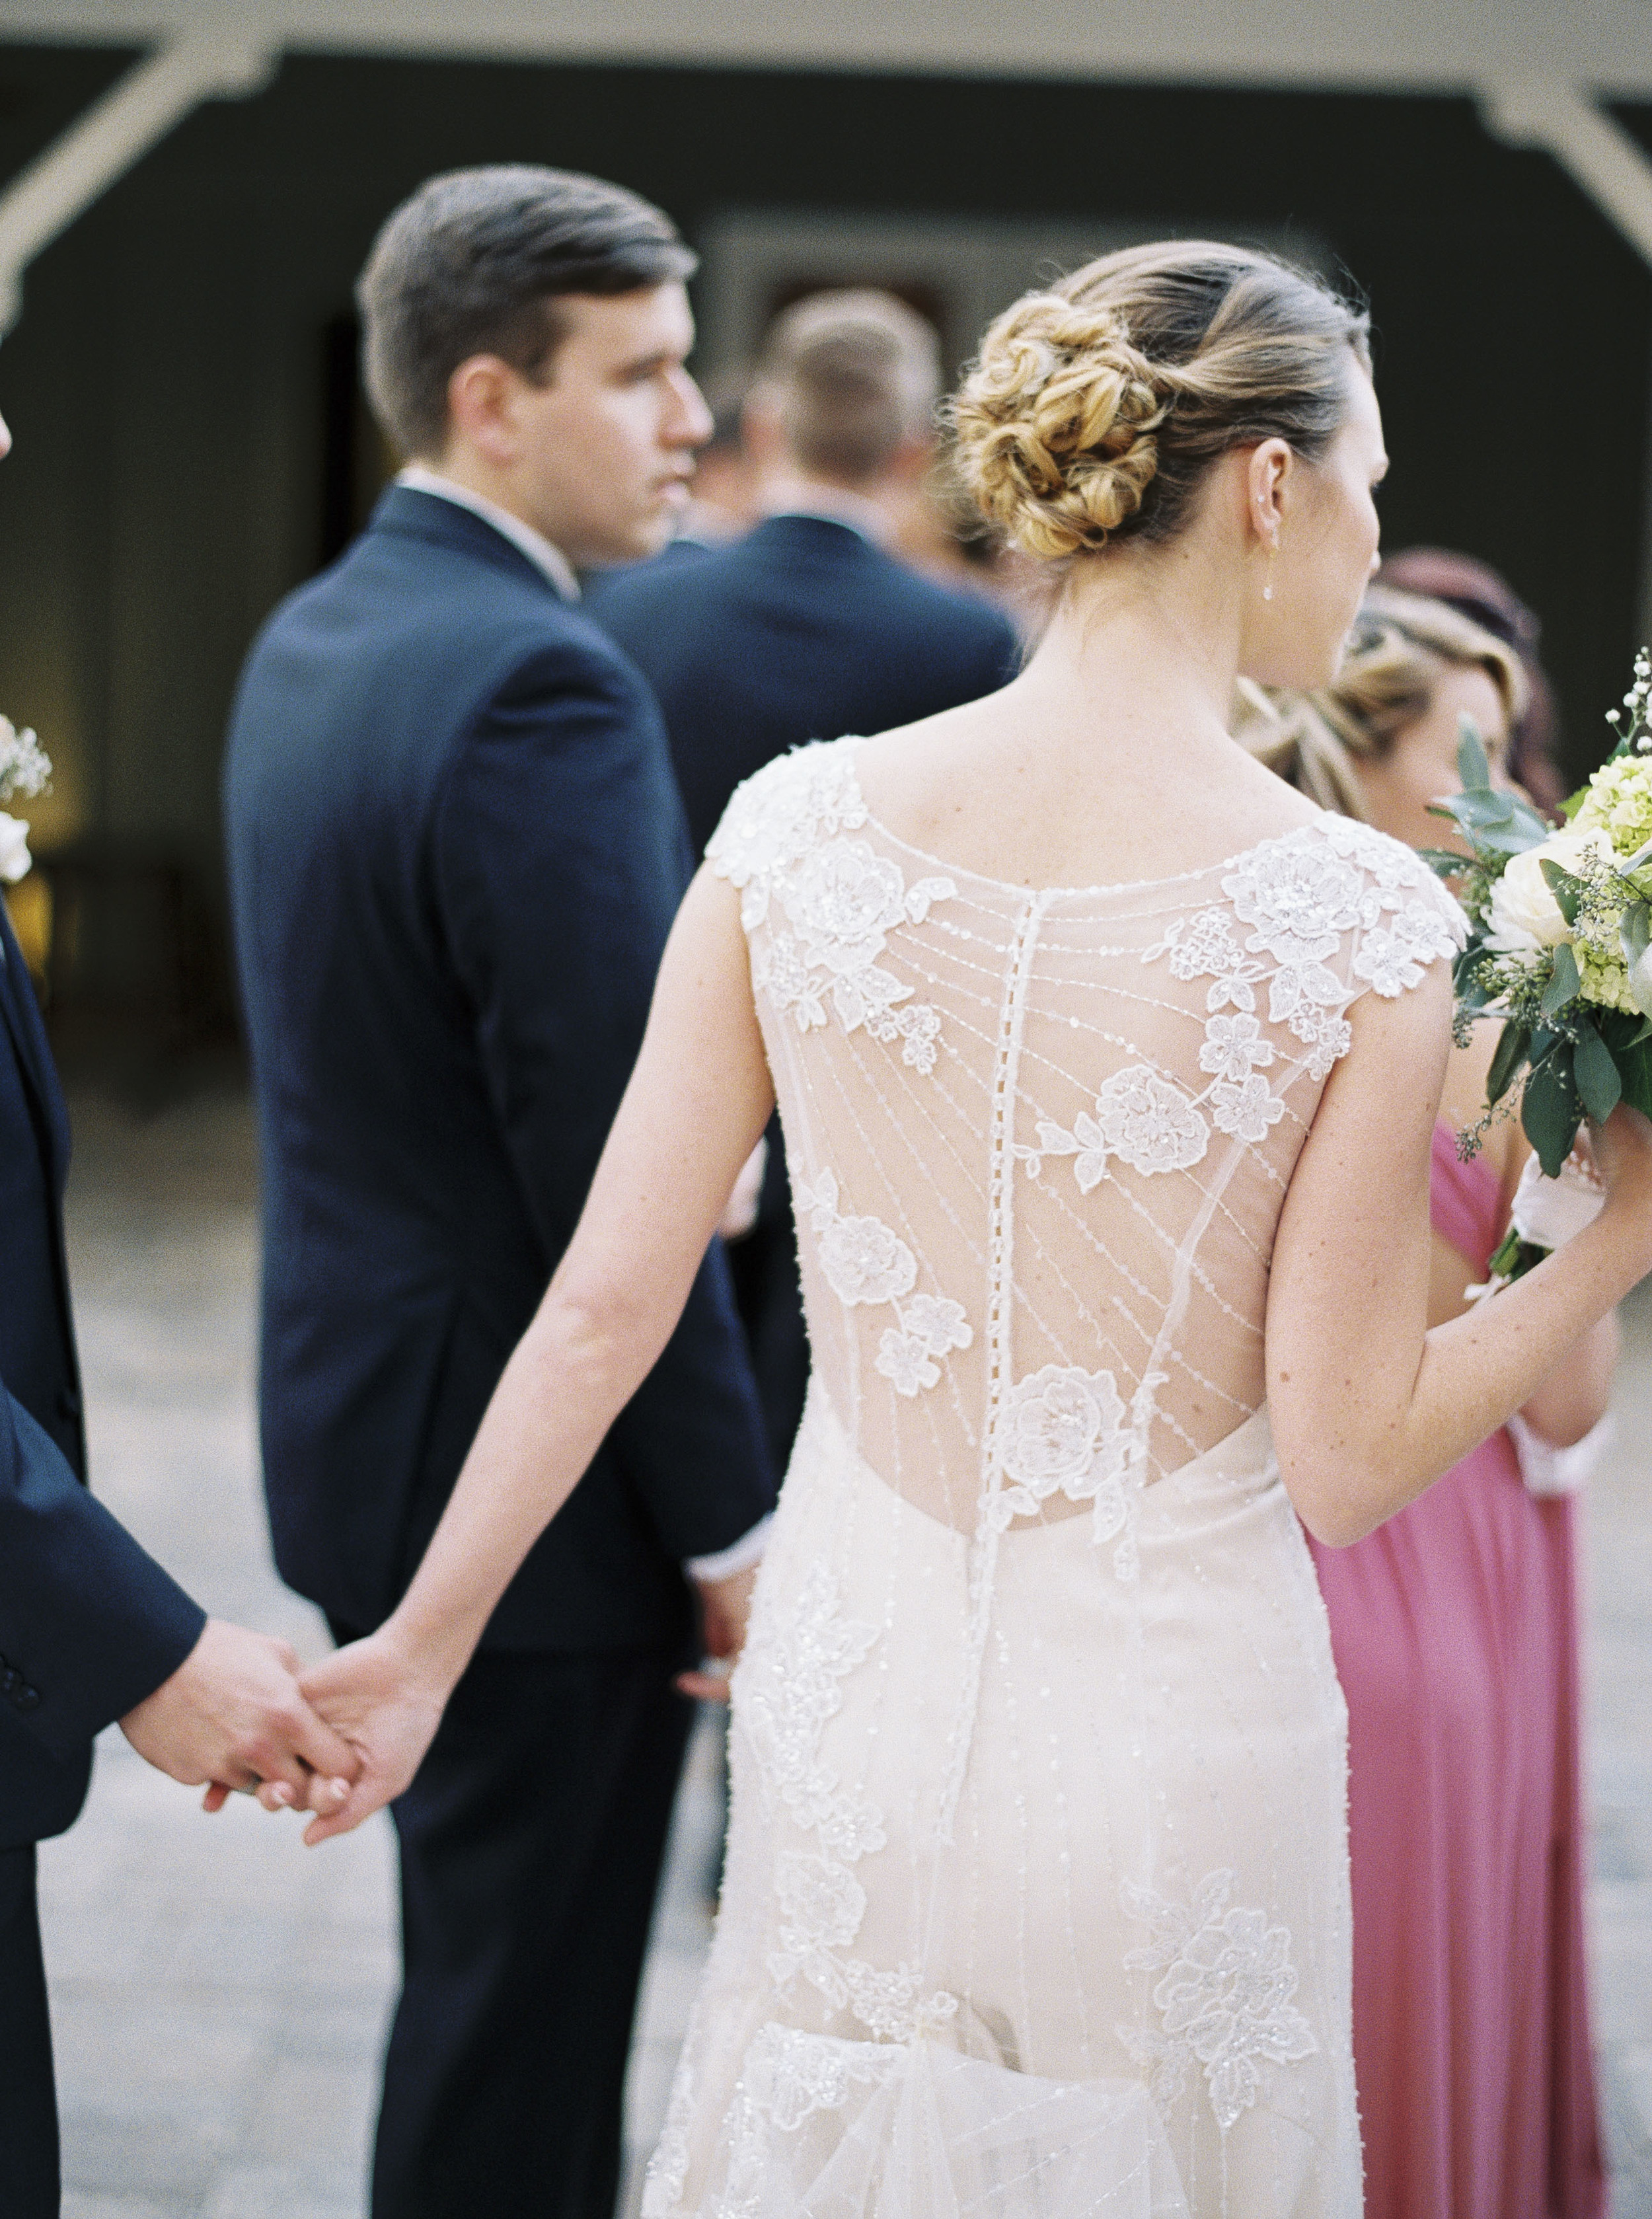 Bowing Oaks Plantation Wedding, Amanda Lenhardt Photography Dallas, Austin, and Destination